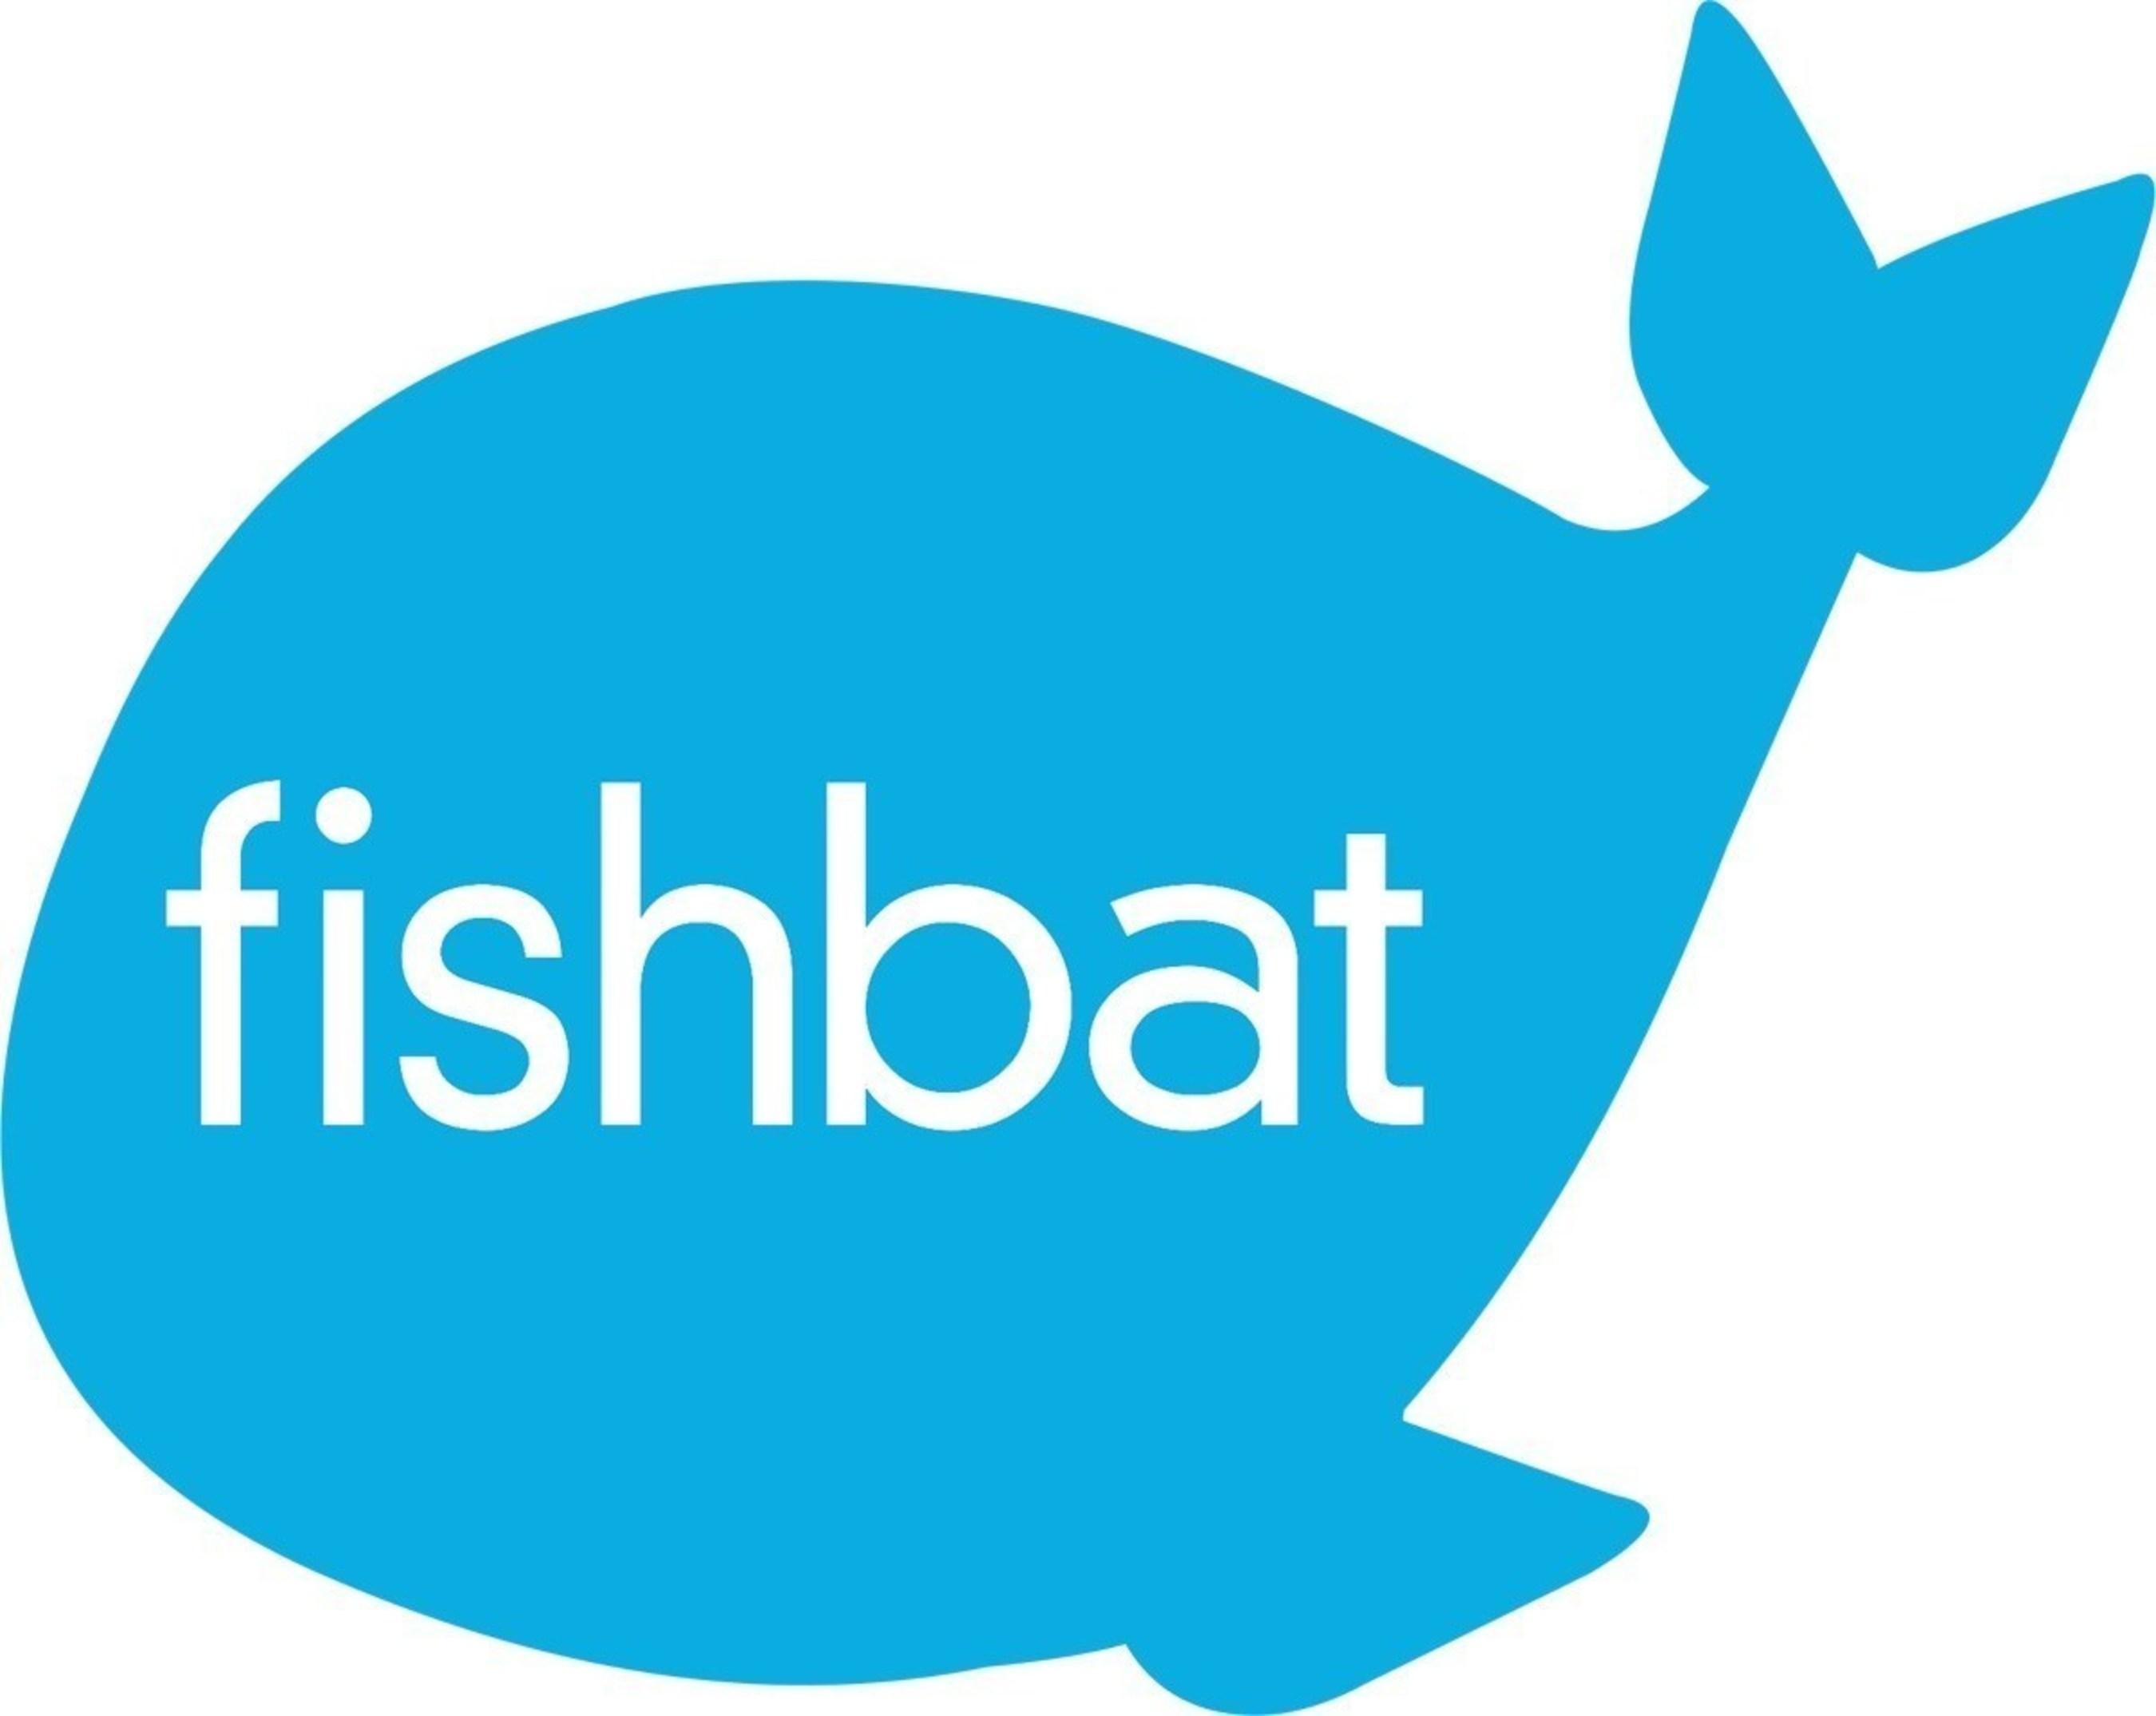 fishbat CEO Clay Darrohn Discusses 3 Ways Live-Streaming Helps Brand Marketing